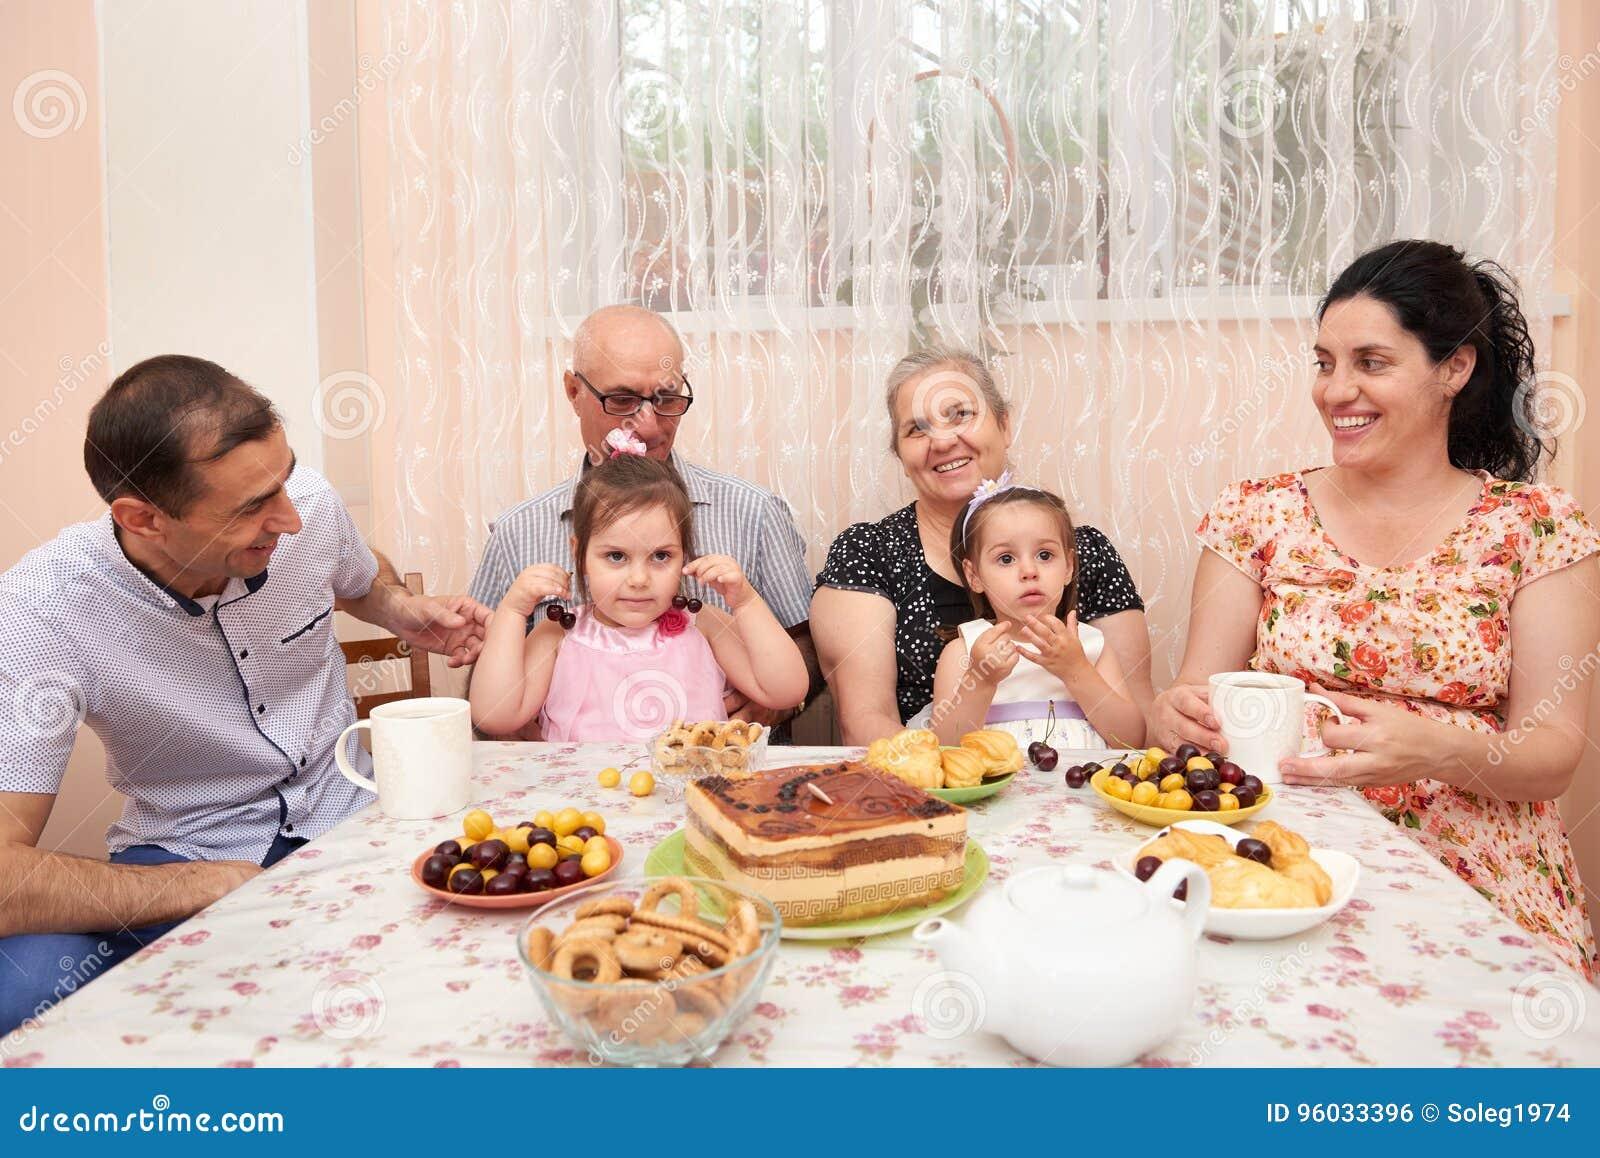 Duża rodzinna pije herbata w jadalni